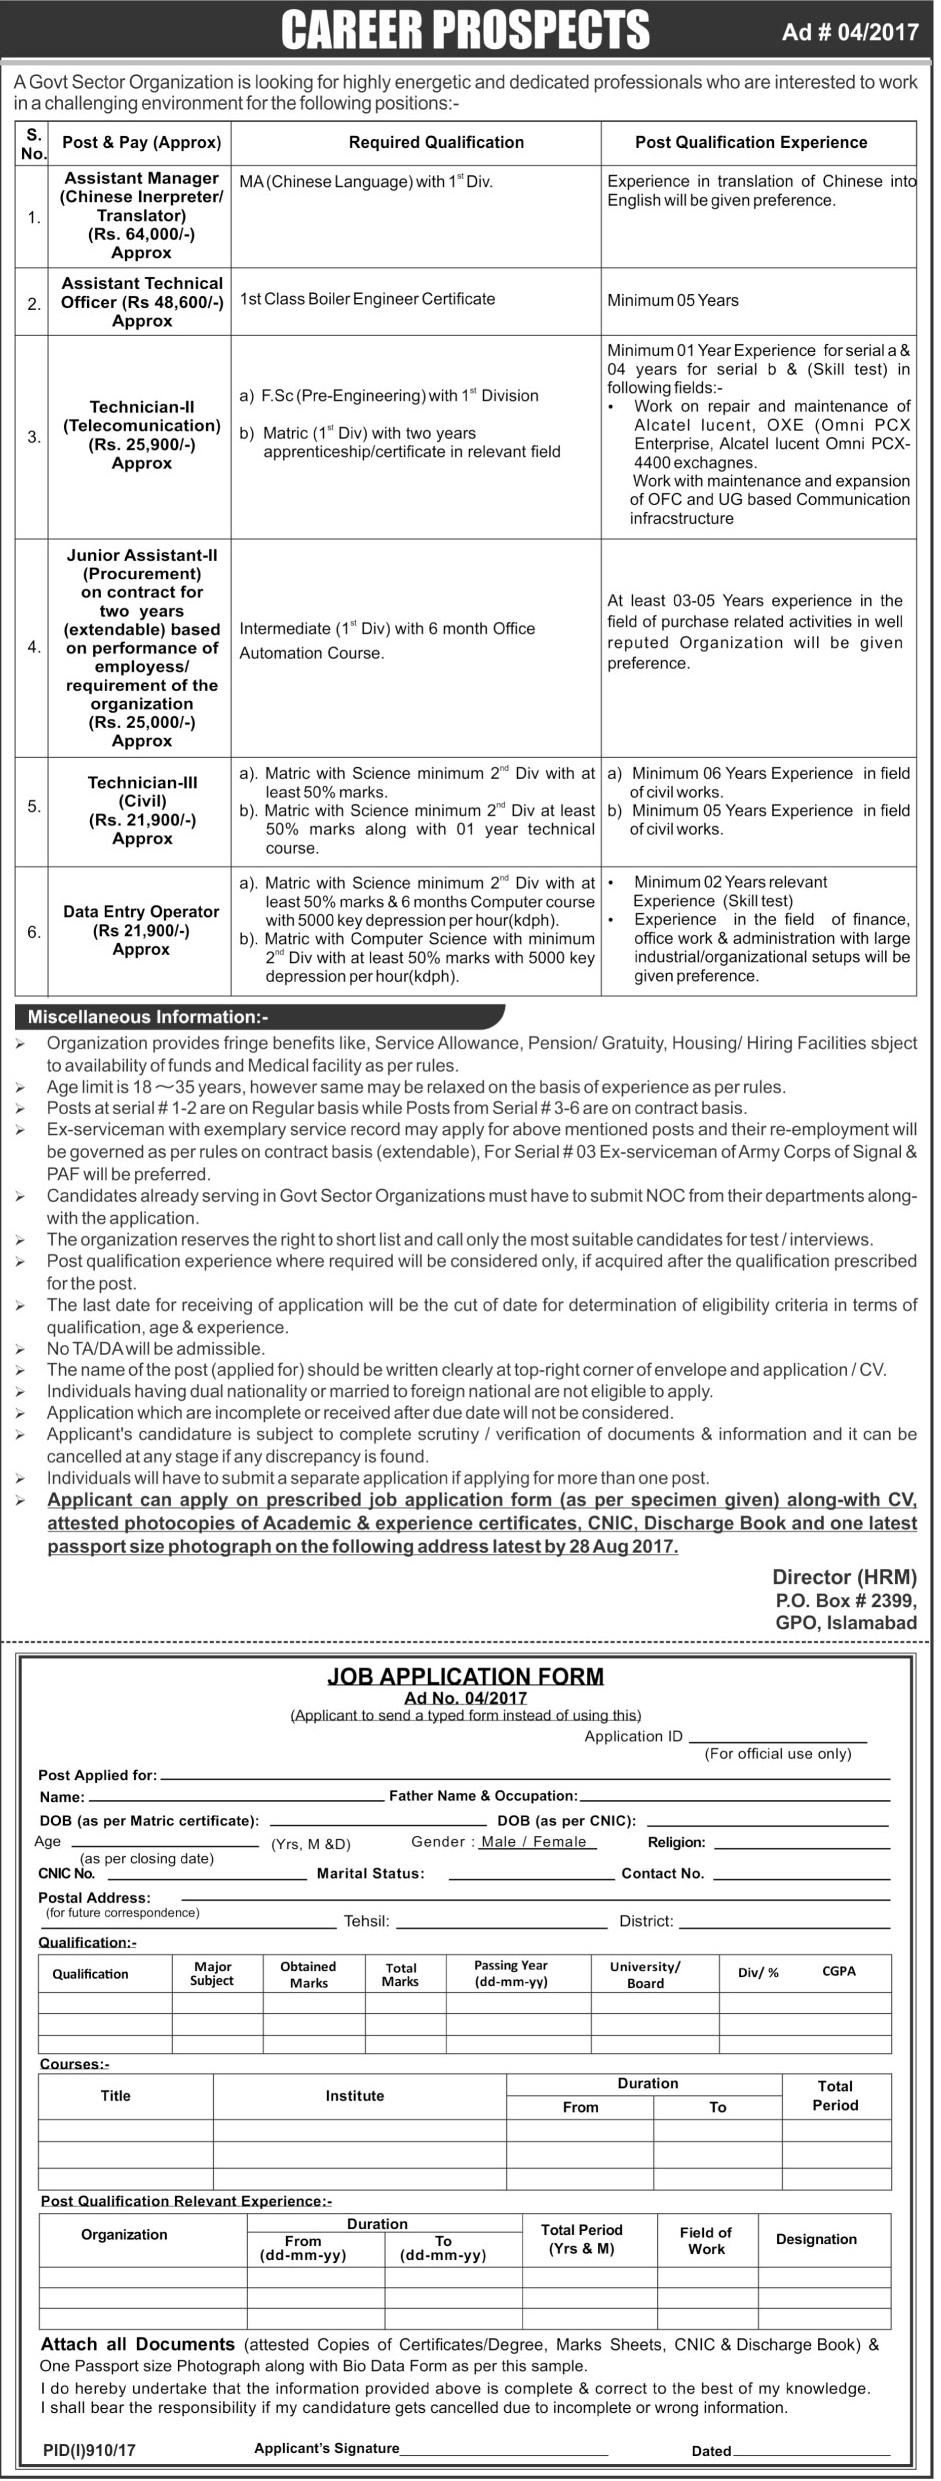 Govt Sector Organization Jobs PO Box 2399 GPO Islamabad Jobs 2017